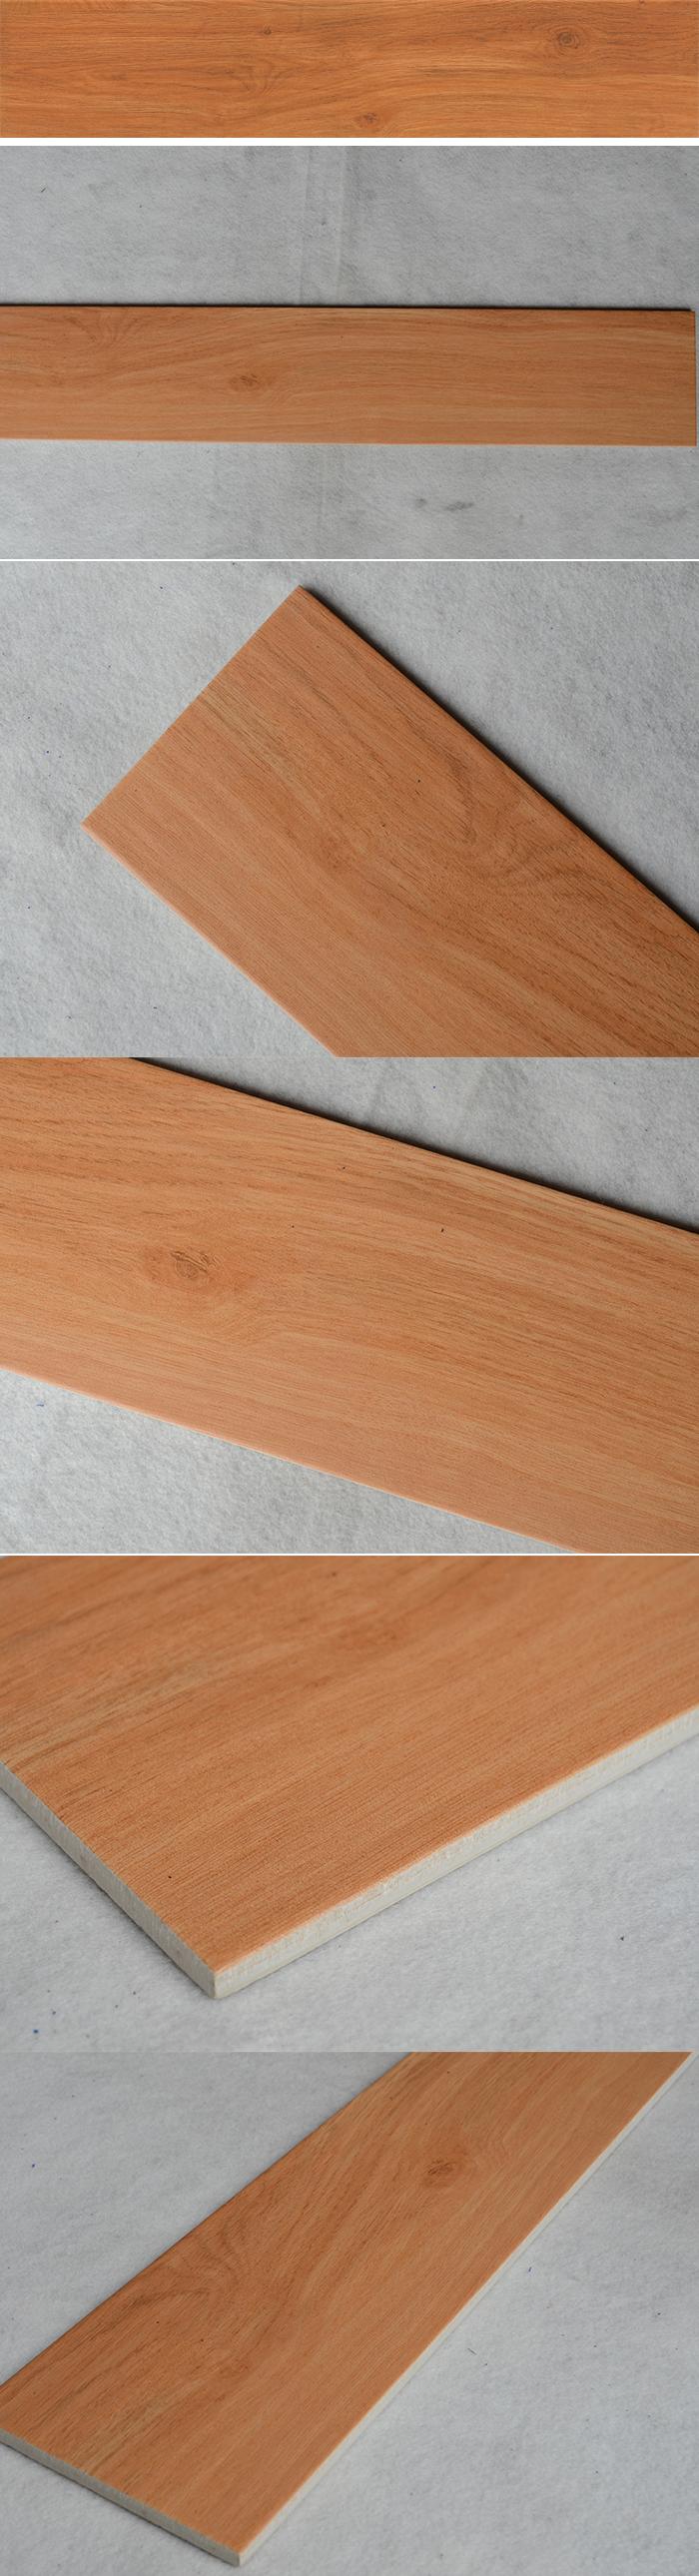 Hj15804m floor tile bangkok thailand34x34 floor tileinterlocking hj15804m floor tile bangkok thailand34x34 floor tileinterlocking ceramic tile floors dailygadgetfo Gallery